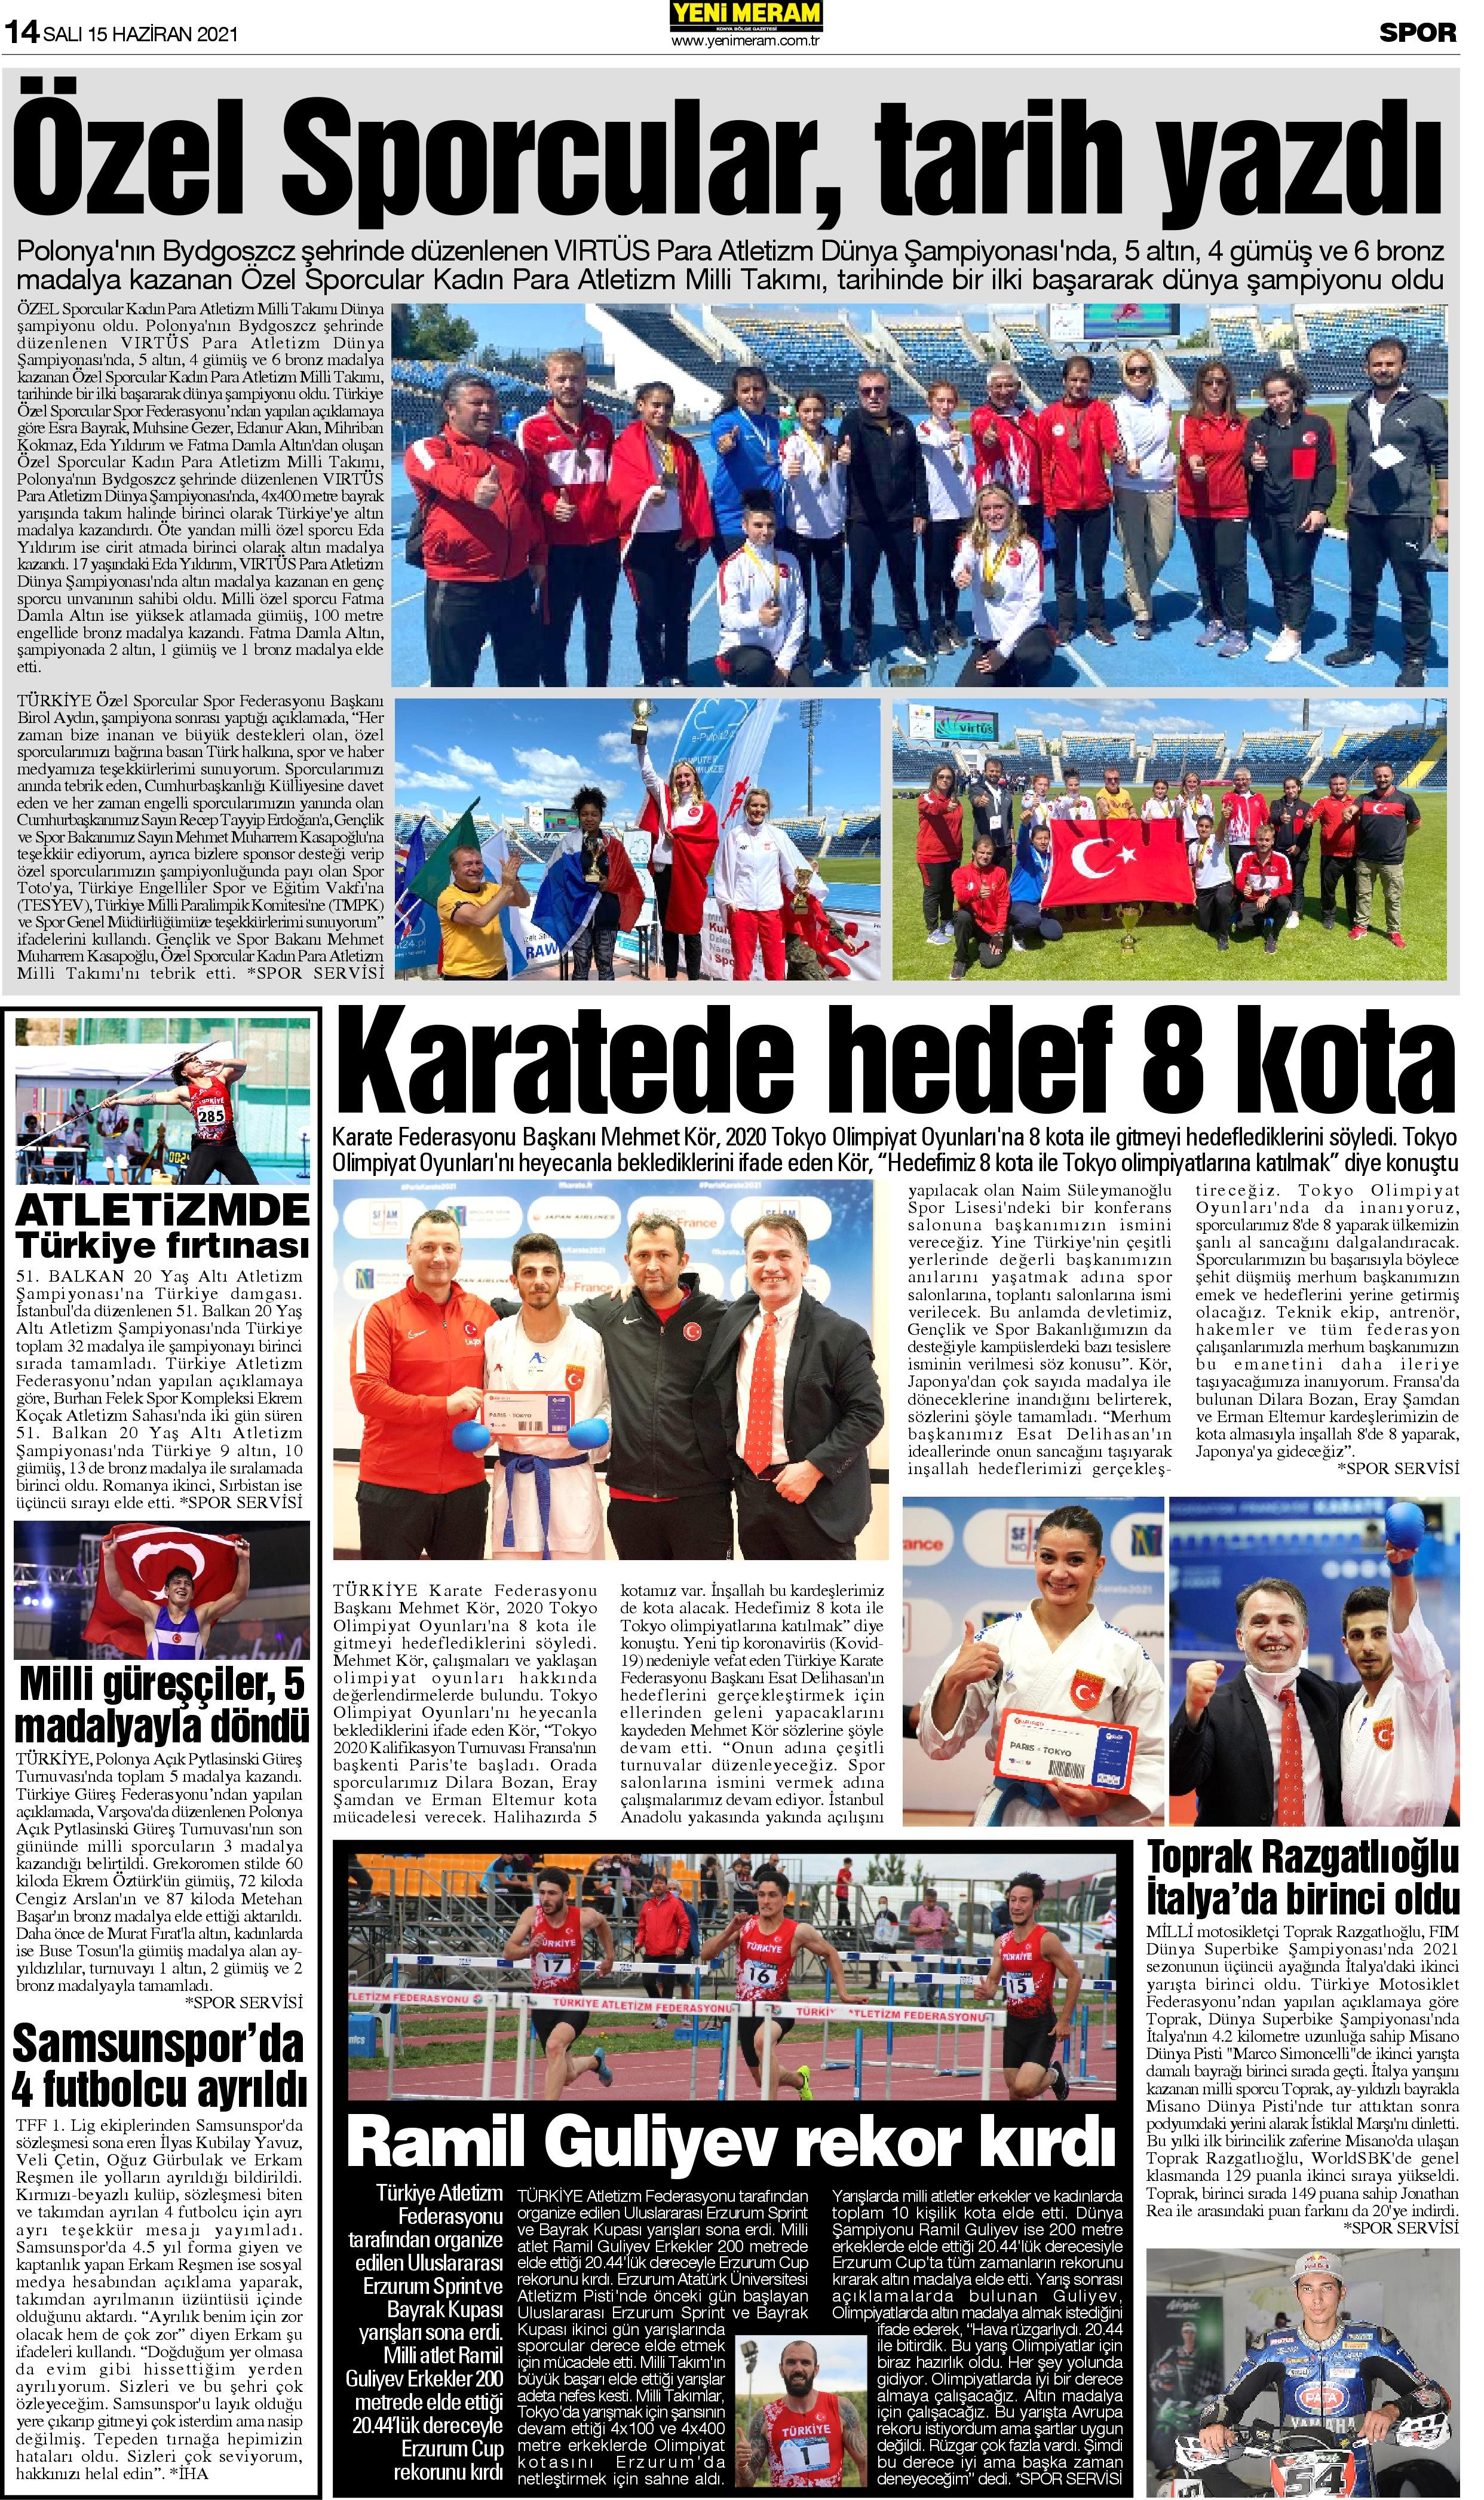 15 Haziran 2021 Yeni Meram Gazetesi